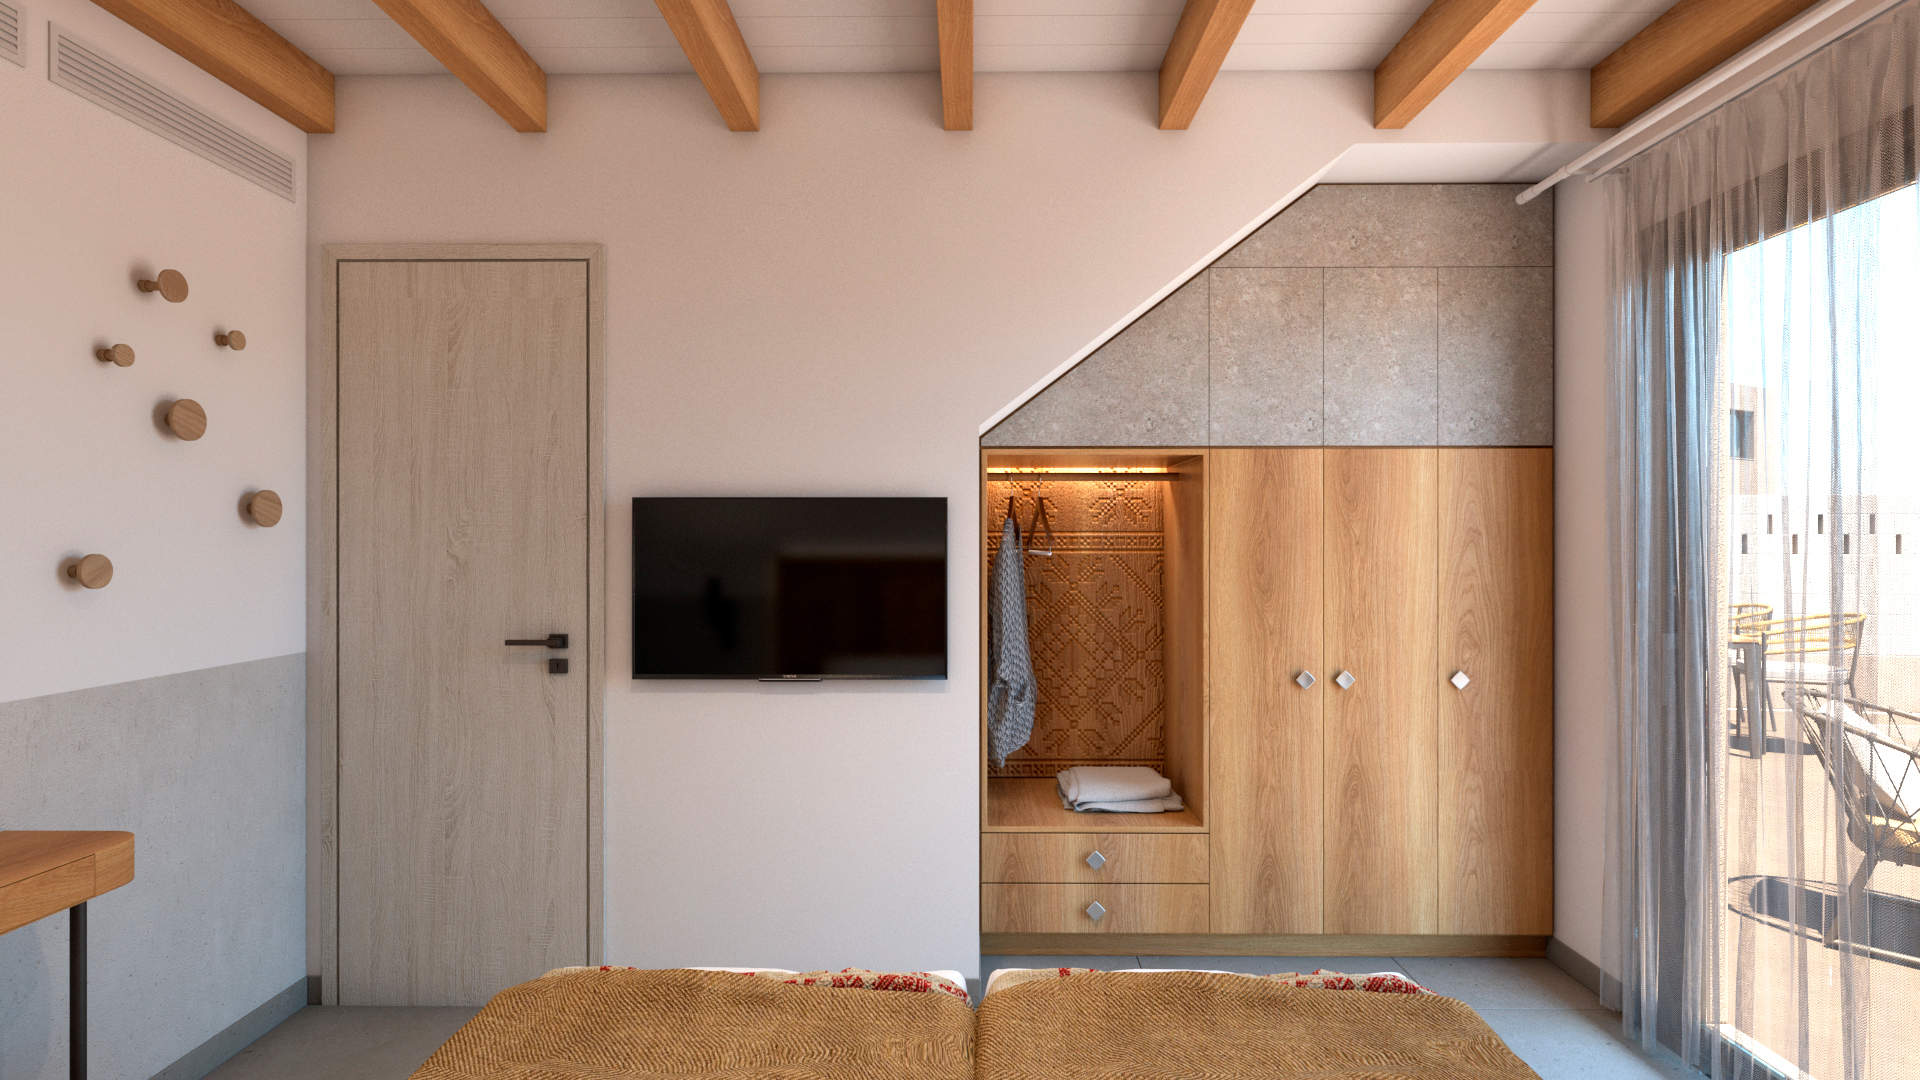 villas complex, interior design, bedroom, wardrobe. Συγκρότημα τουριστικών κατοικιών, εσωτερικός χώρος, υπνοδωμάτιο, ντουλάπι.